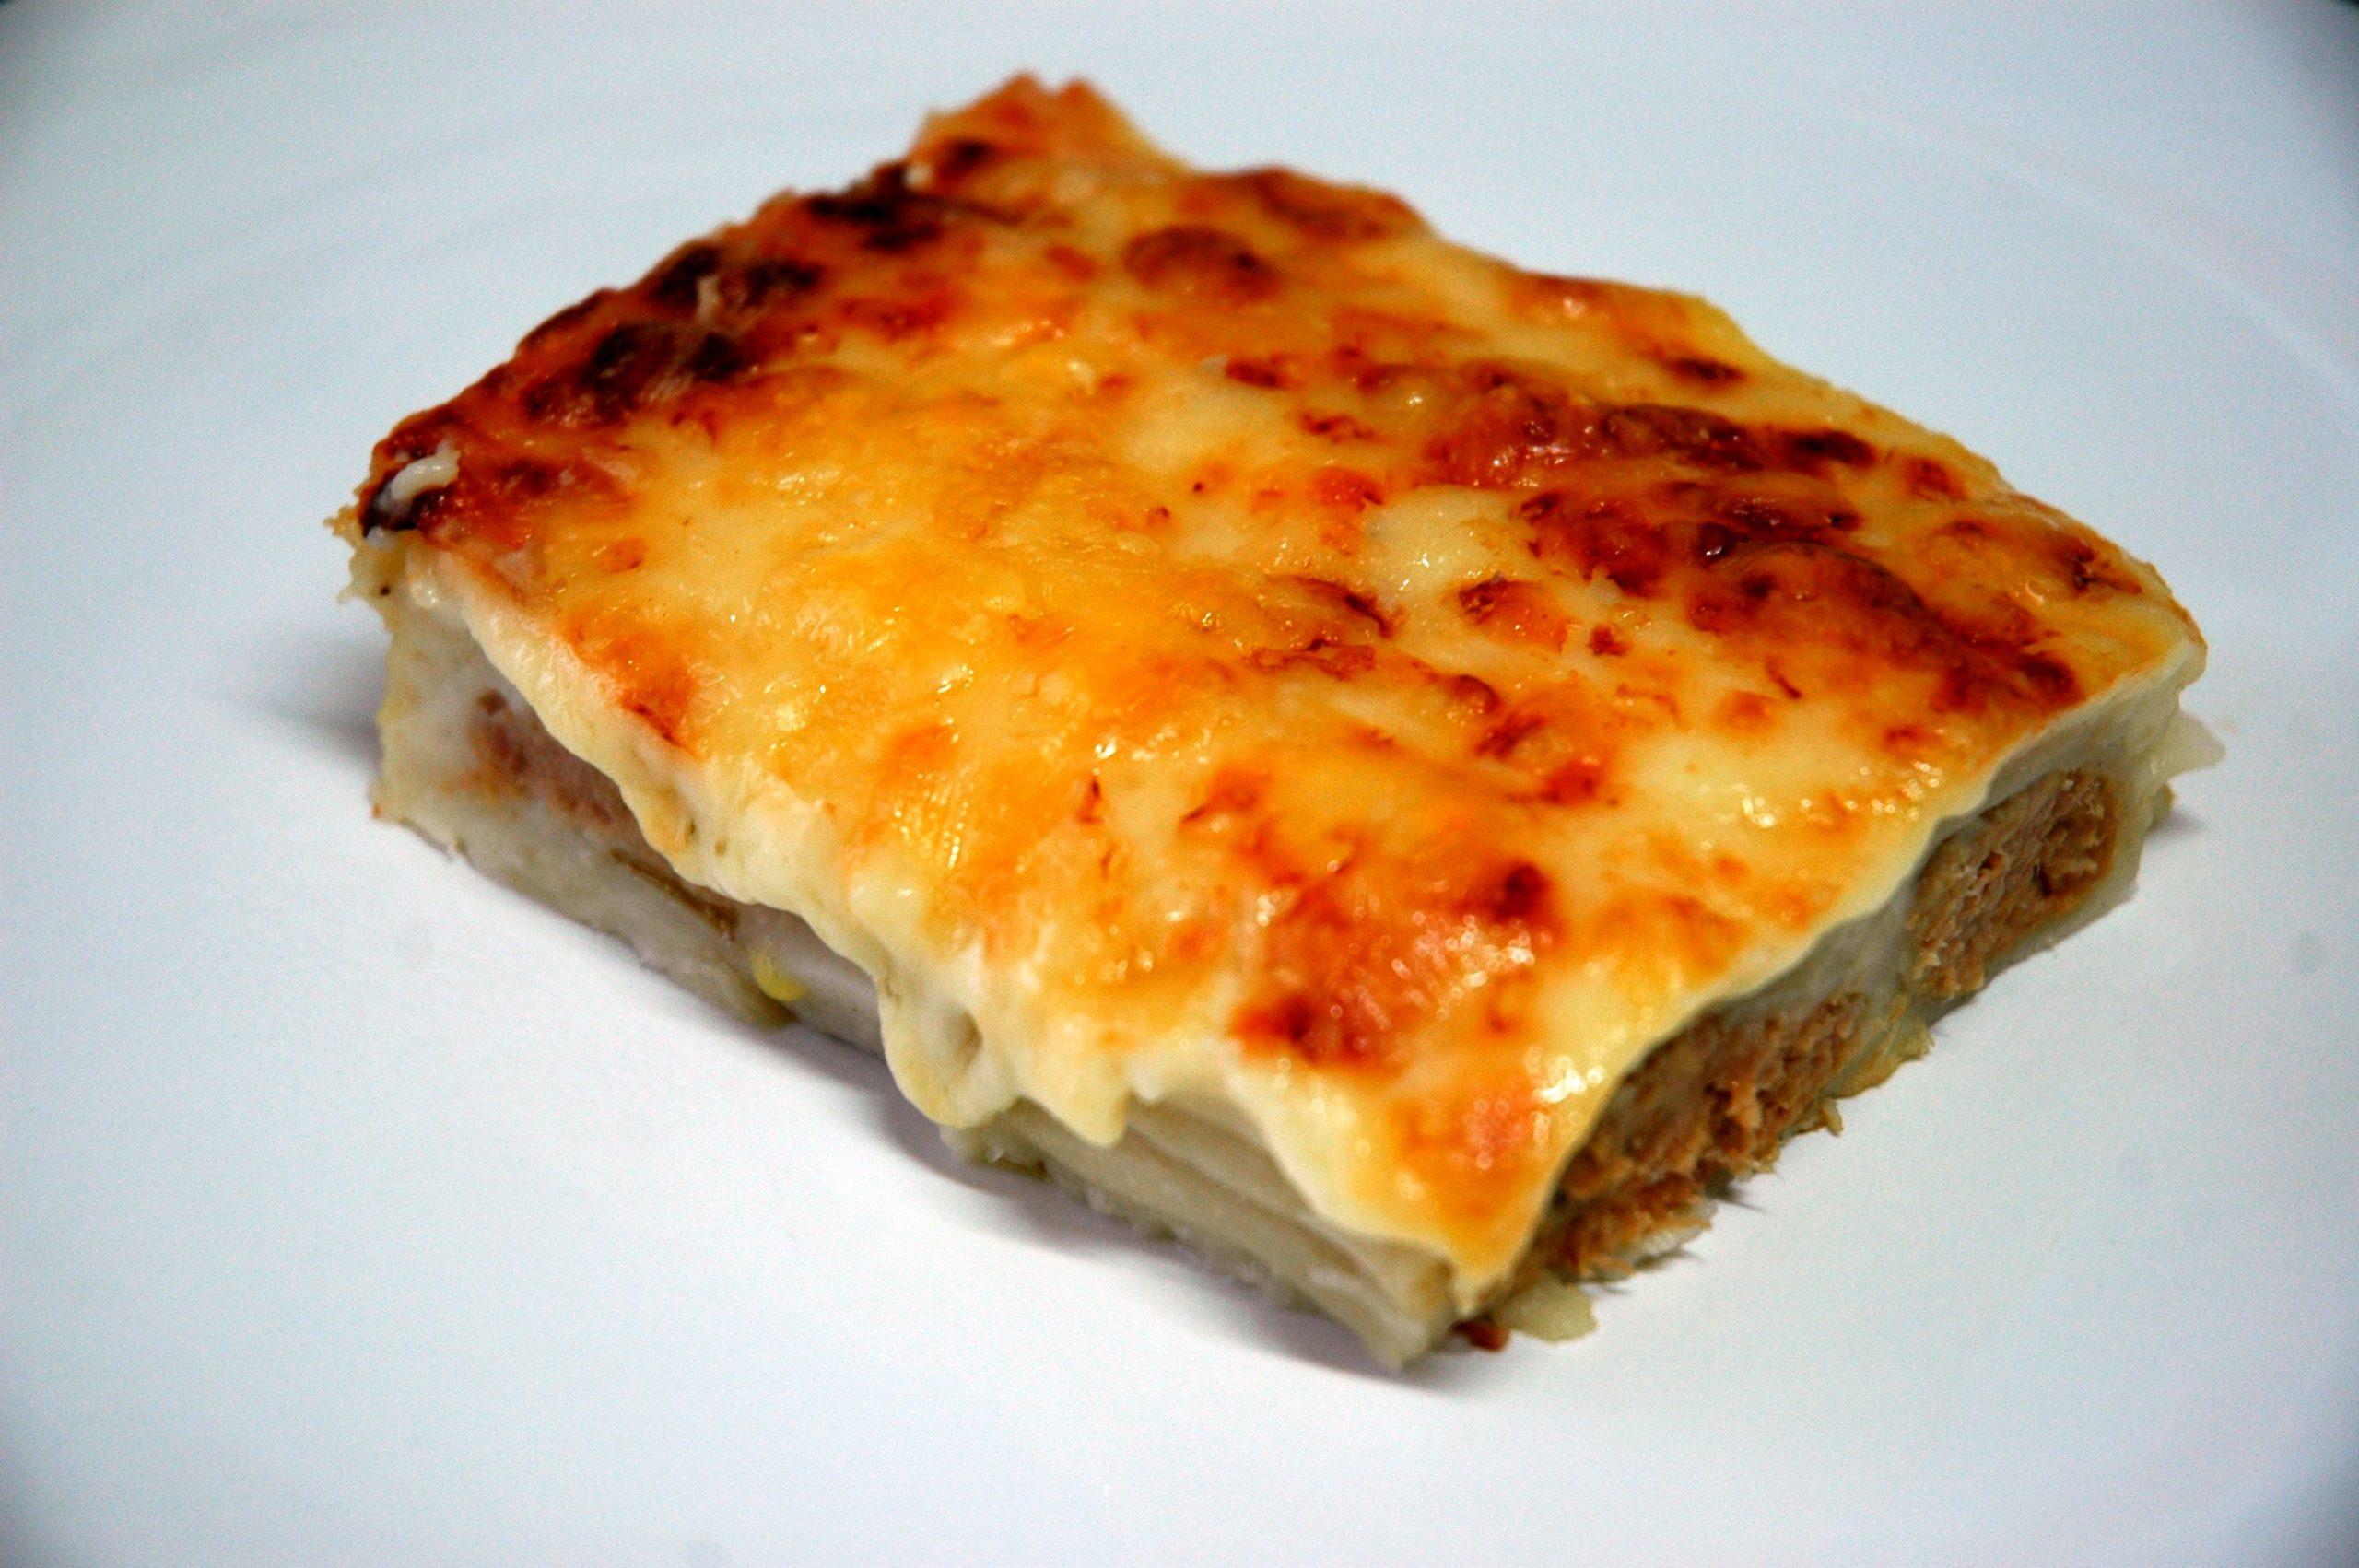 Canelones Andorra Gastronomia - Wikimedia CC